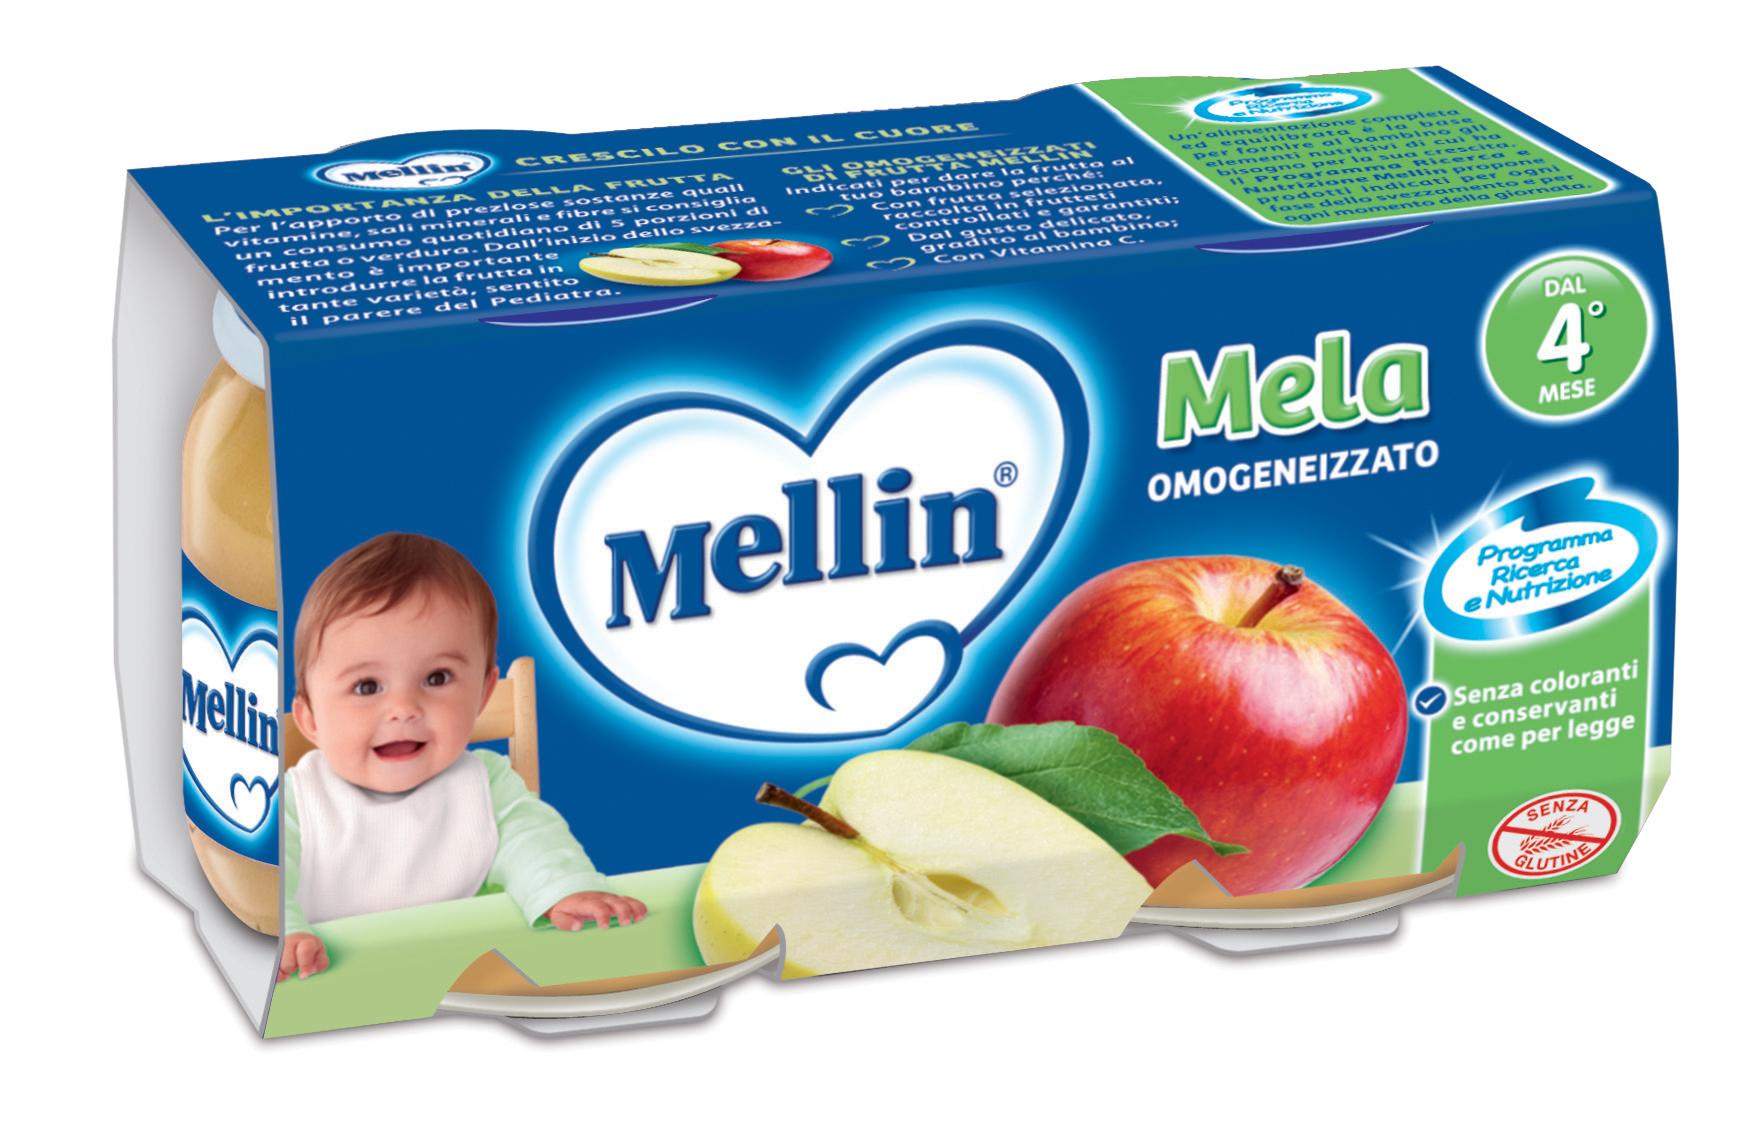 Omogeneizzato Mellin Mela